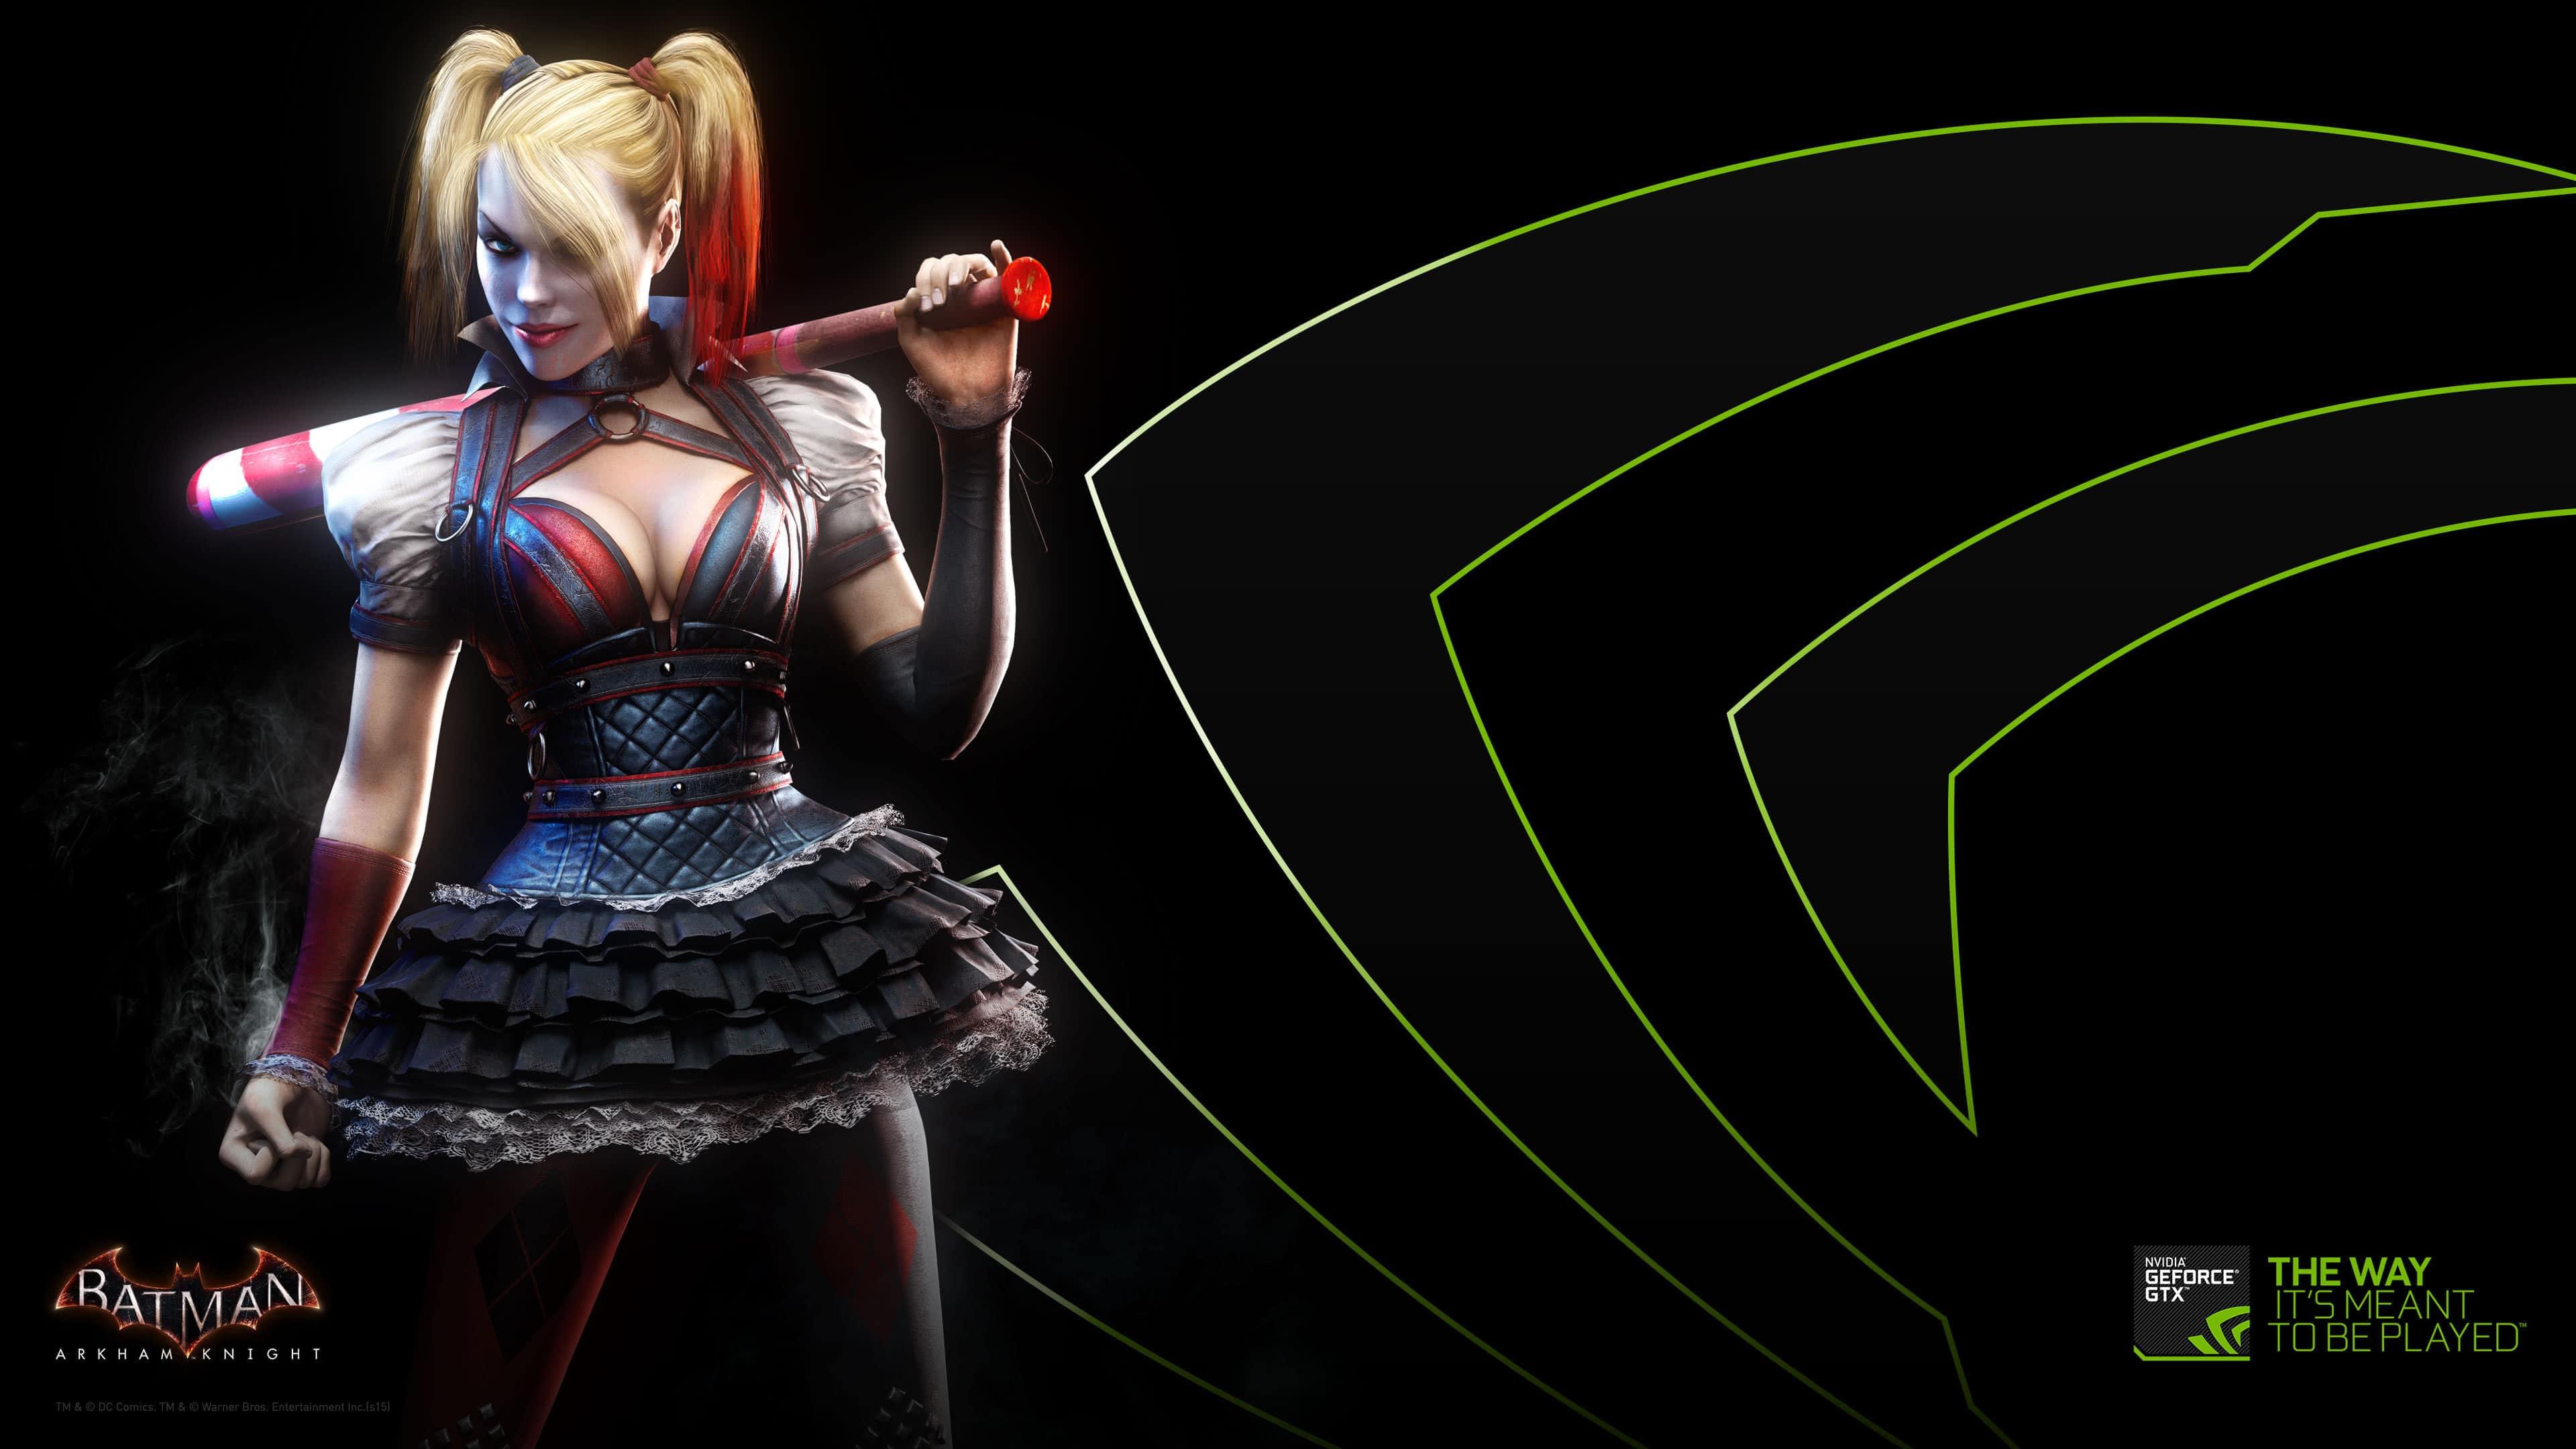 Images For Cars Wallpaper Nvidia Harley Quinn Arkham Knight Uhd 4k Wallpaper Pixelz